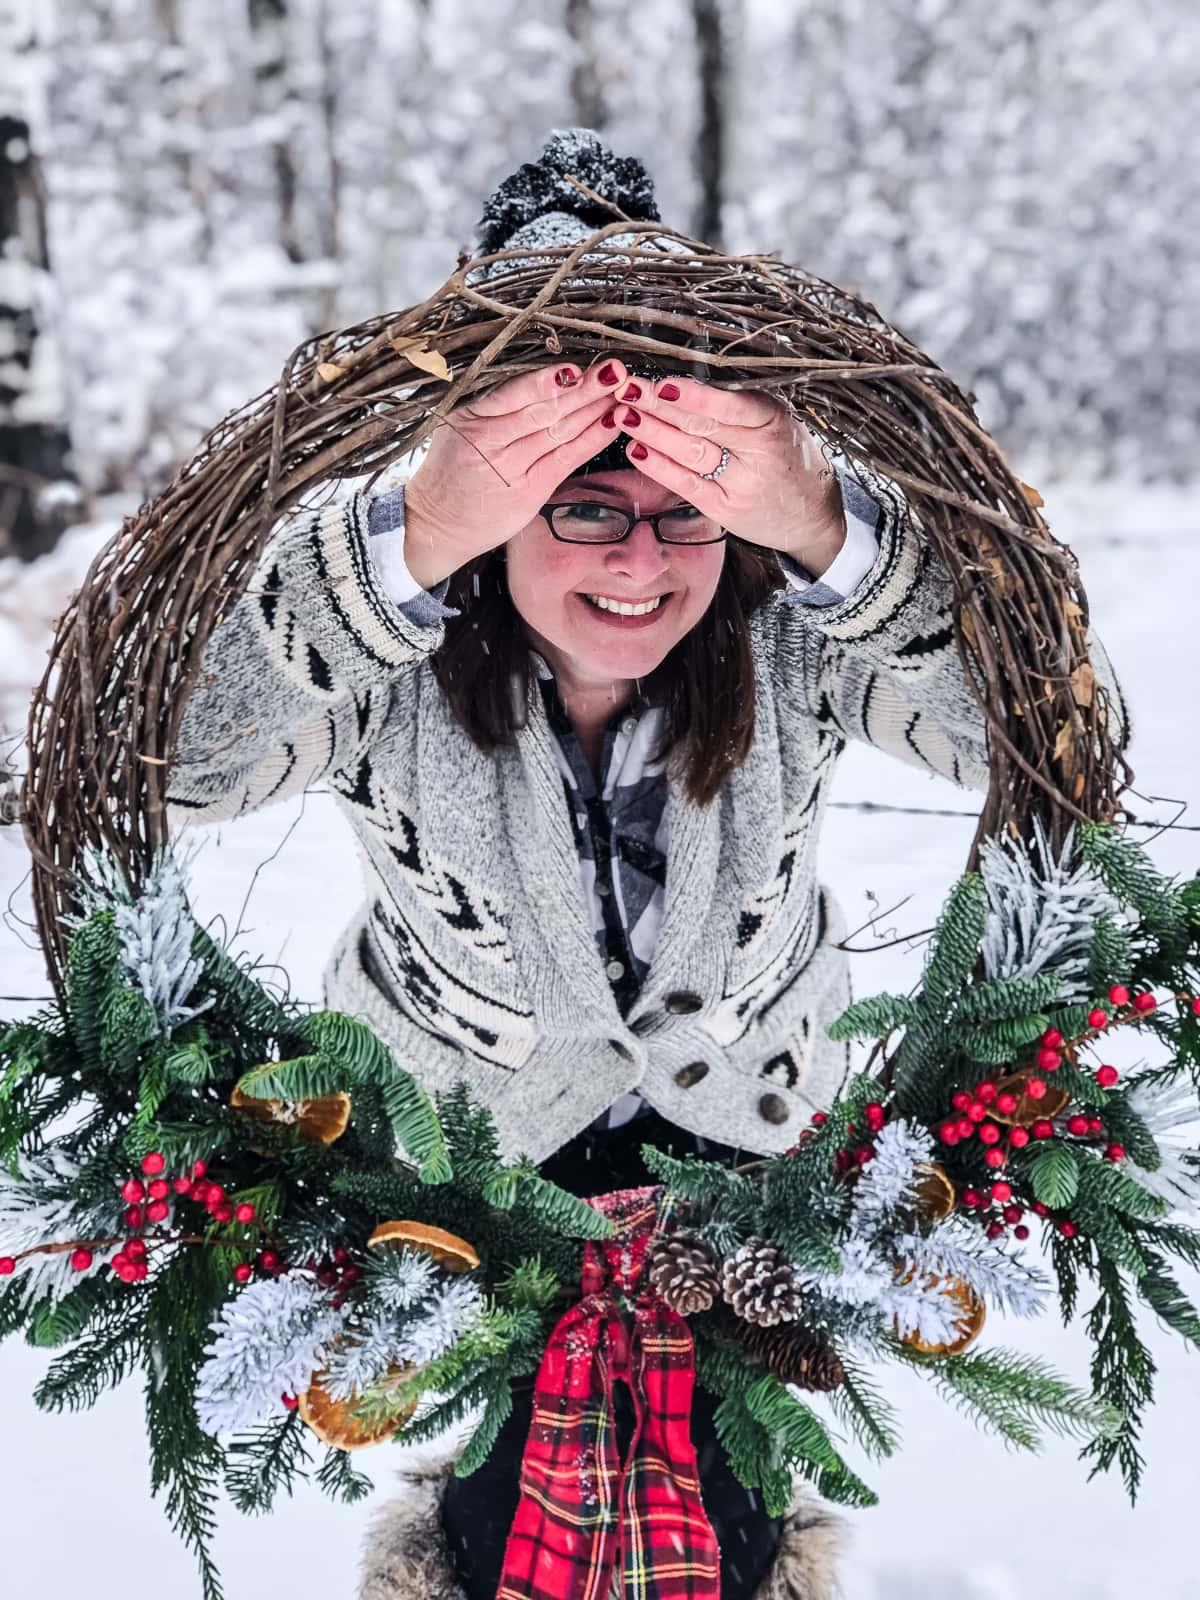 A woman holding a giant Christmas wreath